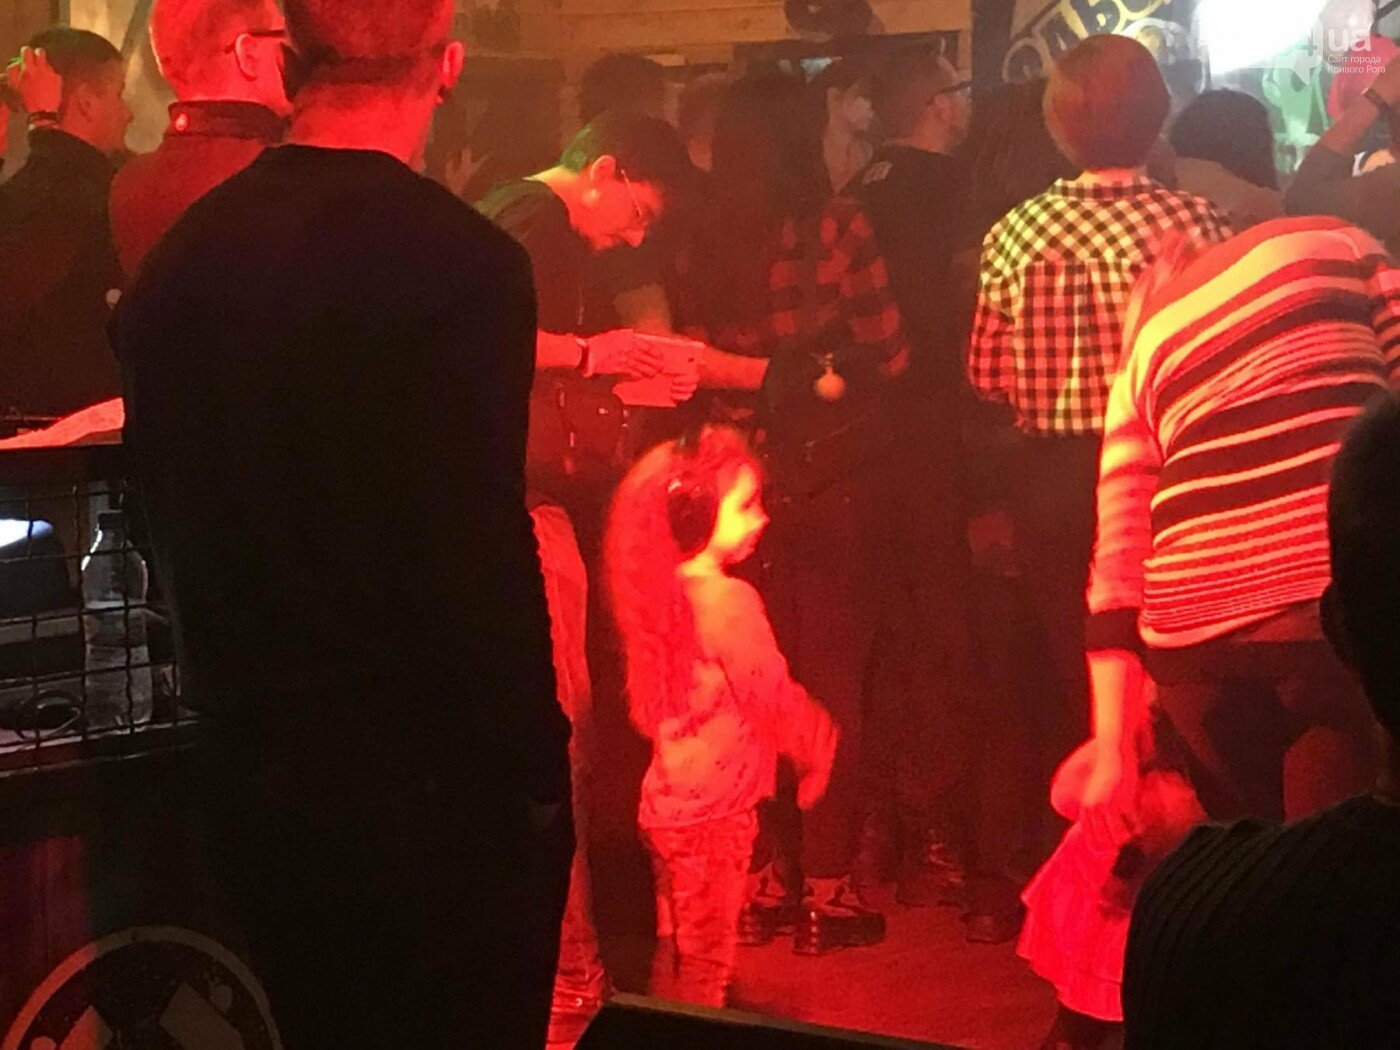 """Тінь Сонця"": Знаменитые хиты ""рок-артиллеристов"" поставили на уши патриотично-творческий Кривбасс (ФОТО, ВИДЕО), фото-6"